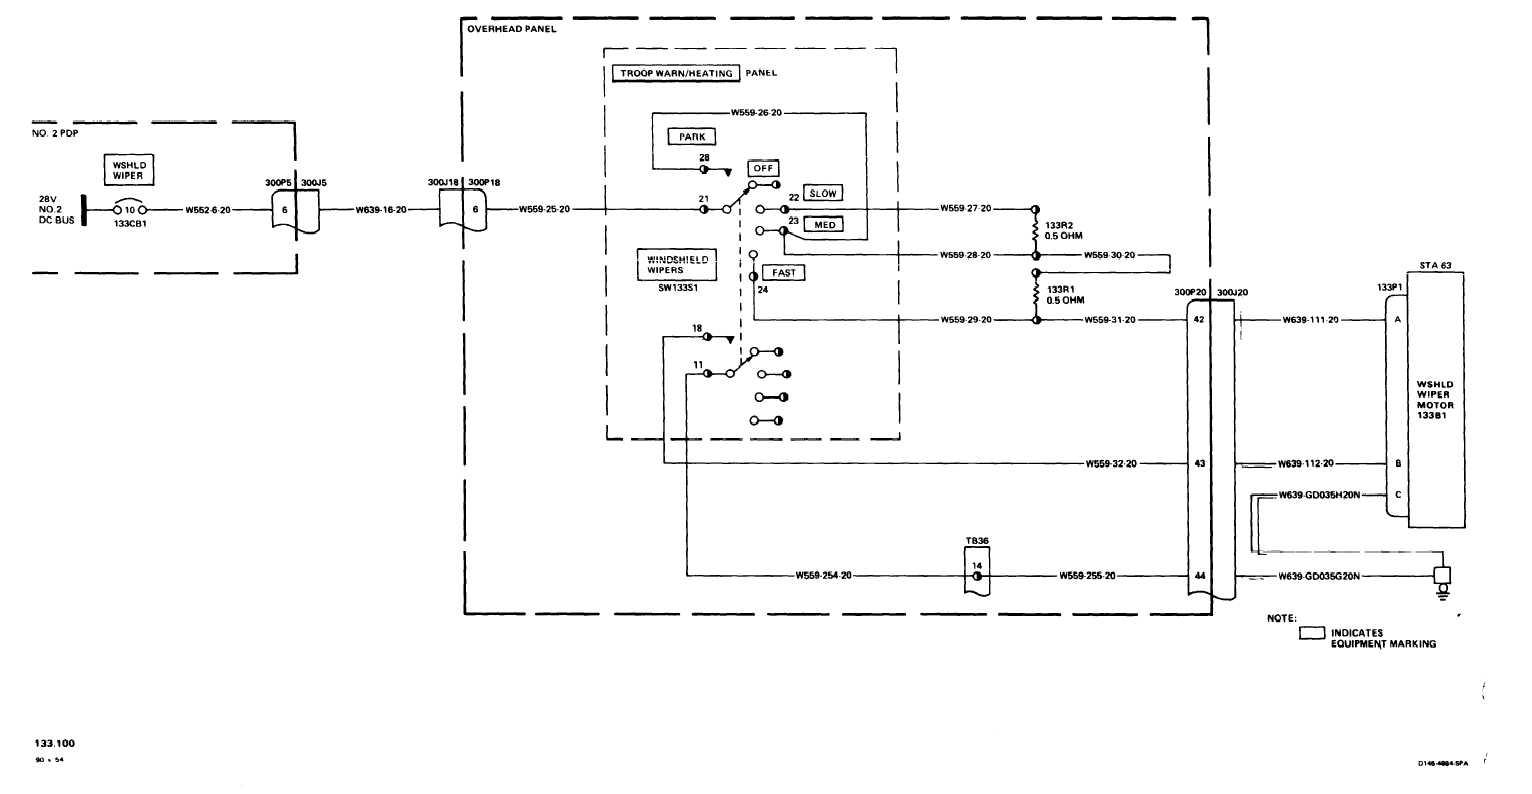 Ford Wiper Diagram